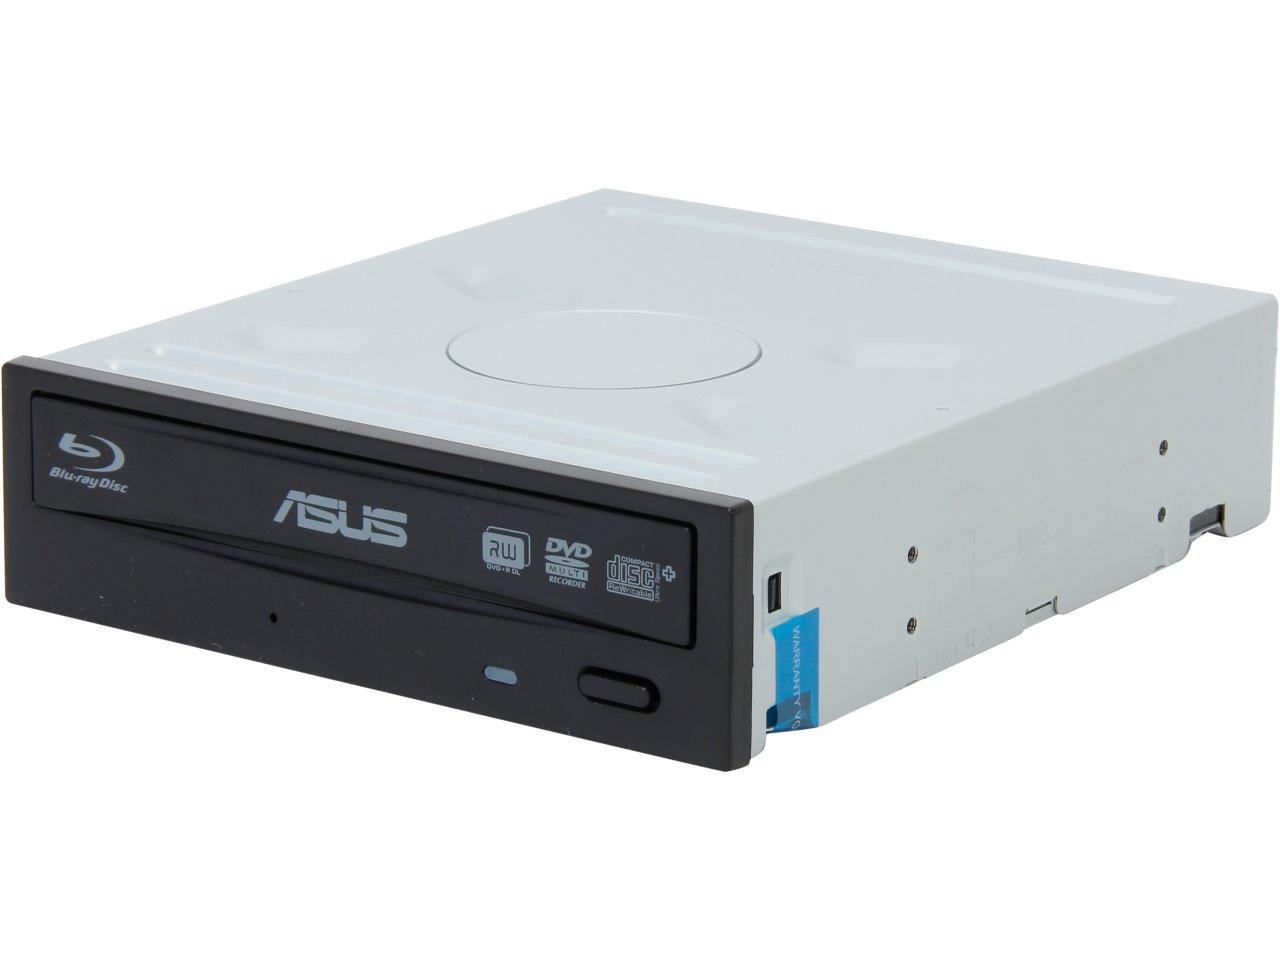 Asus 16x Black Internal SATA Blu-ray Burner for $39.99 AR, Asus USB 3.0 Desktop External 12x Blu-Ray Writer for $47.99 AR (or less) + S&H & More @ Newegg.com